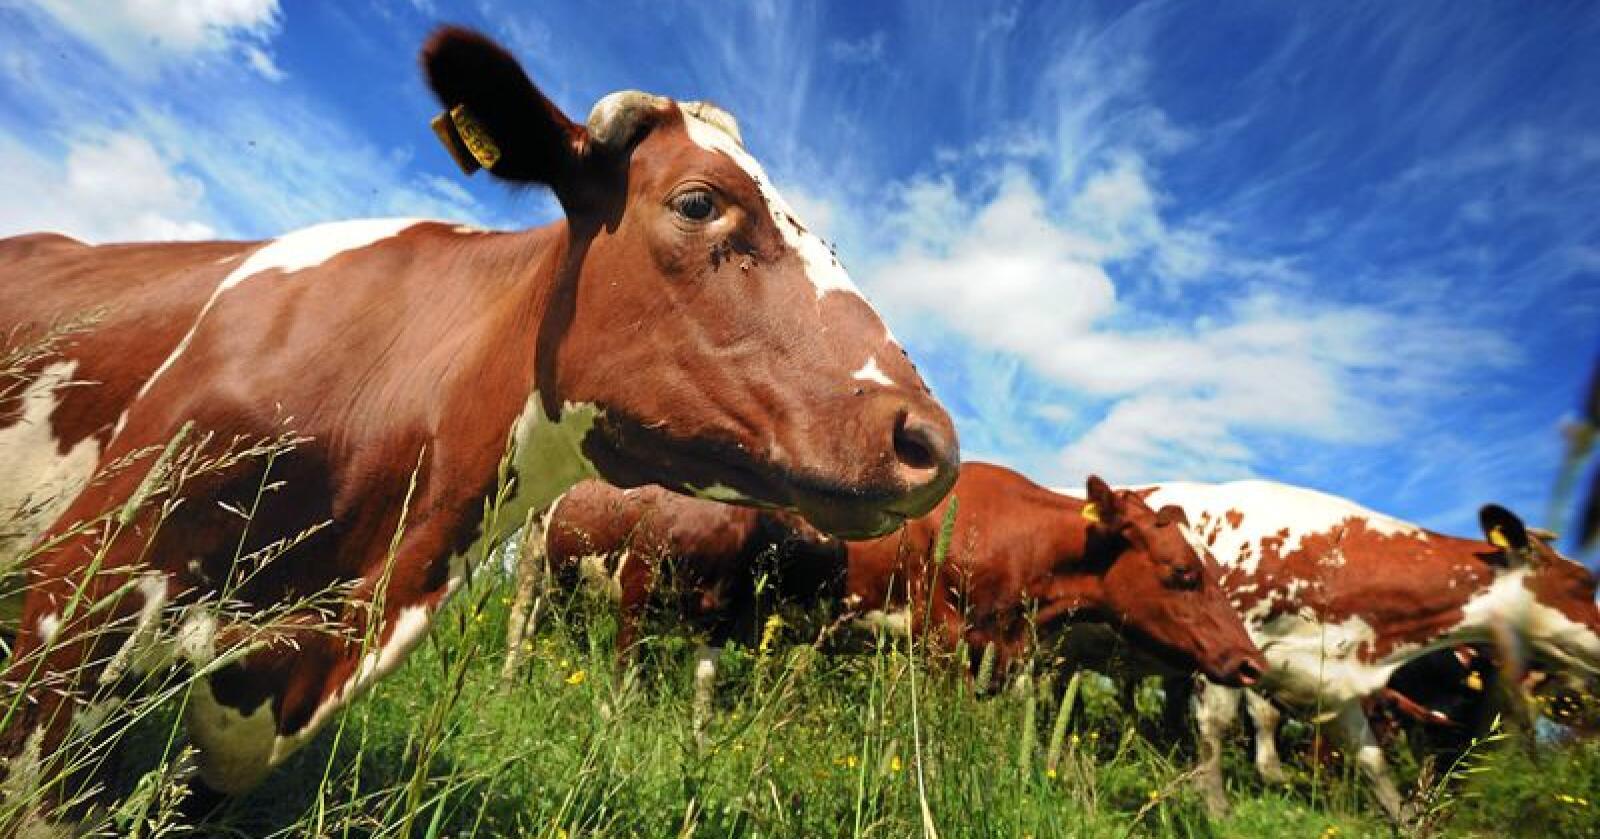 Sunket: Metanutslippene per kg storfekjøtt har sunket kraftig. Foto: Siri Juell Rasmussen